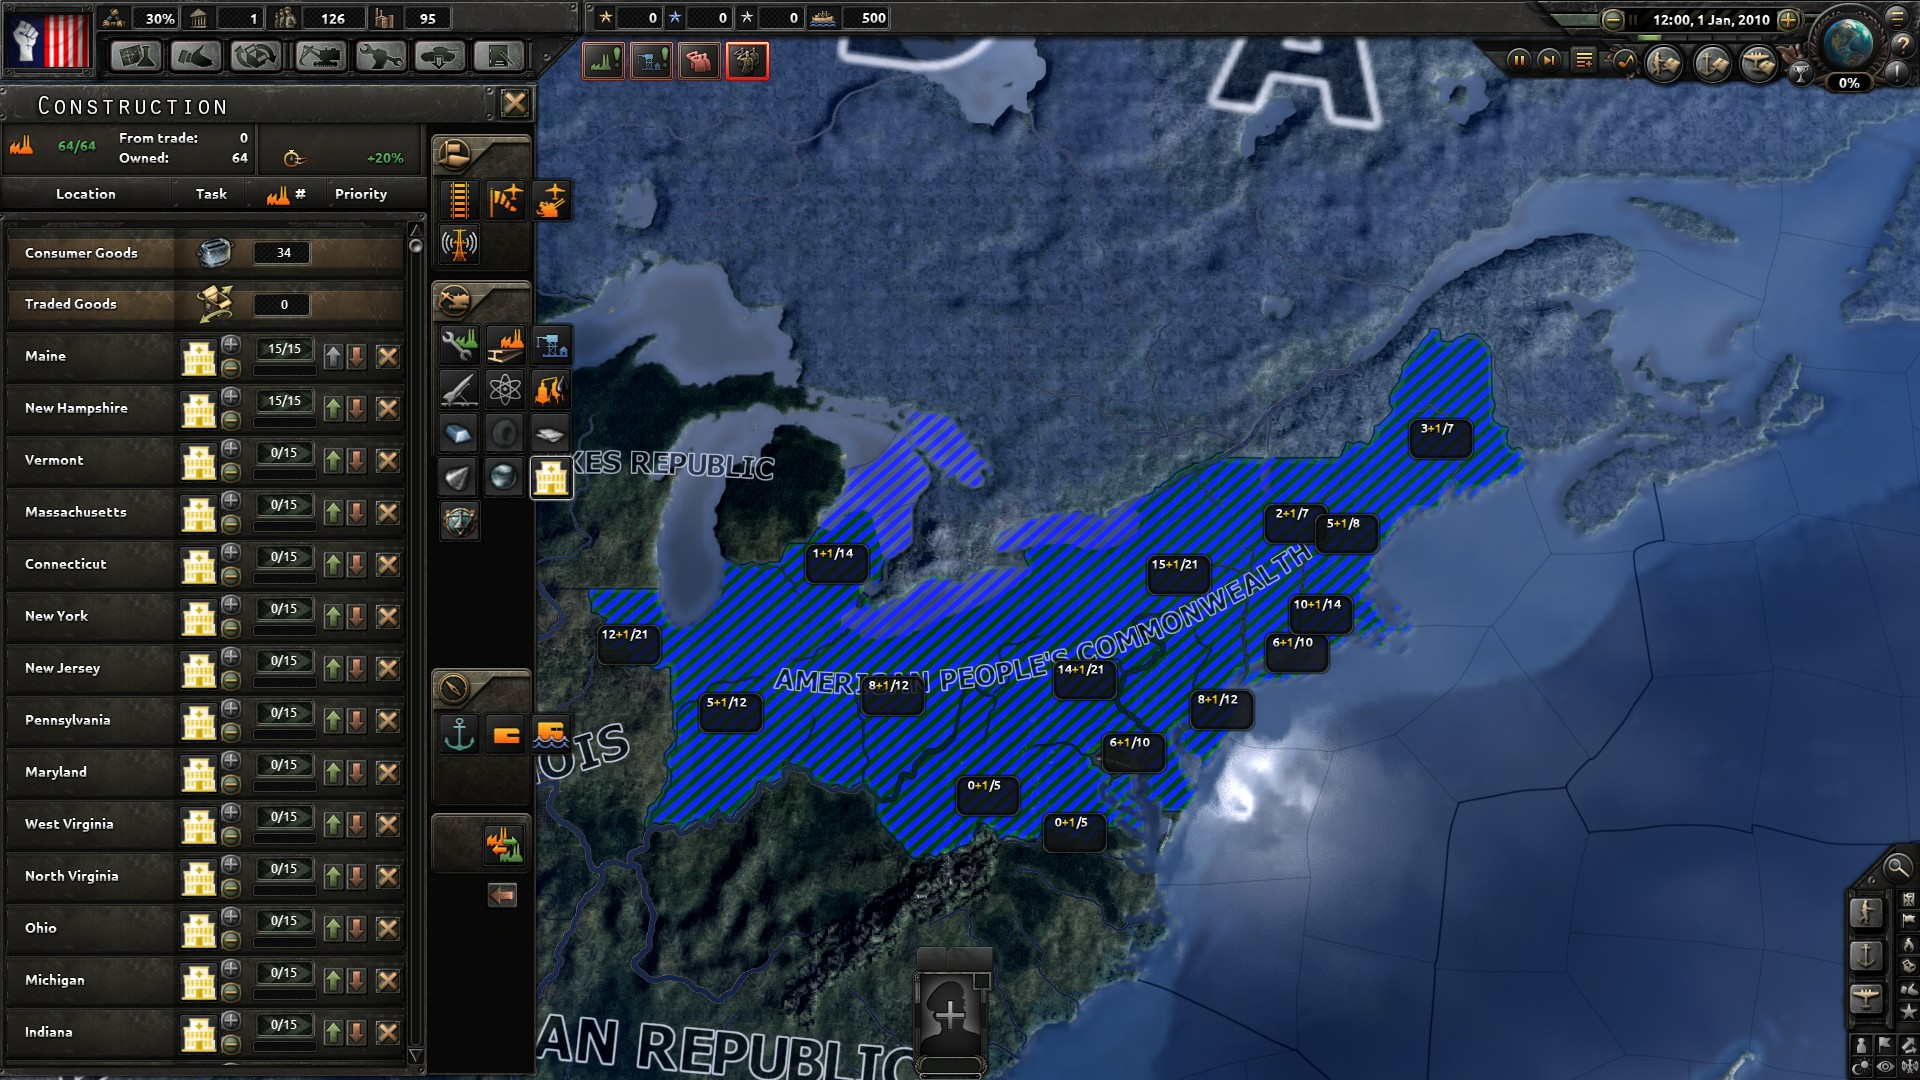 hearts of iron 4 economic crisis mod